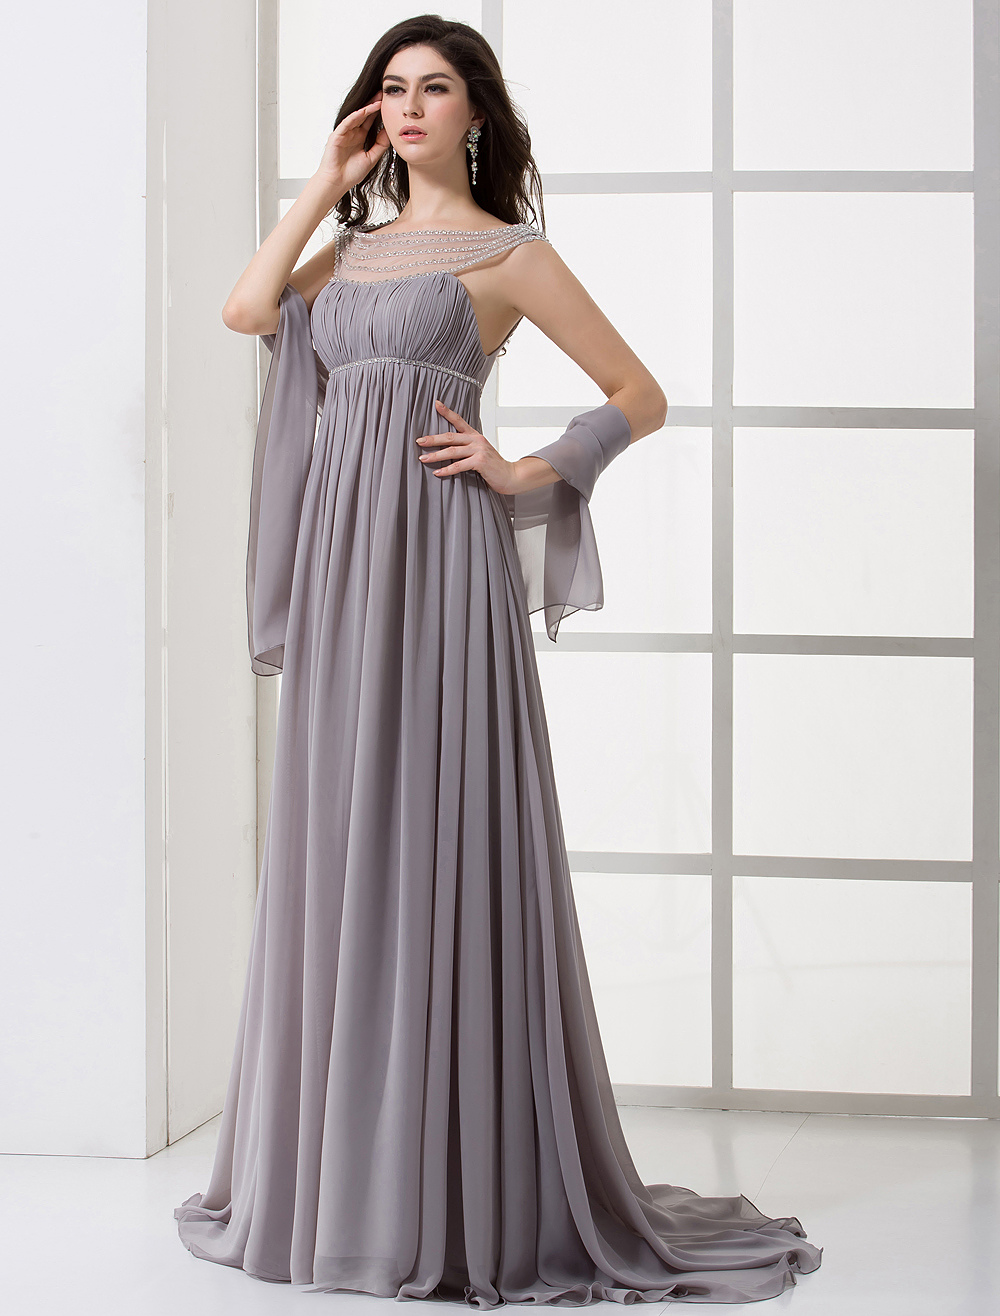 Elegant Lavender Chiffon Pleated High Collar Sexy Evening Dress